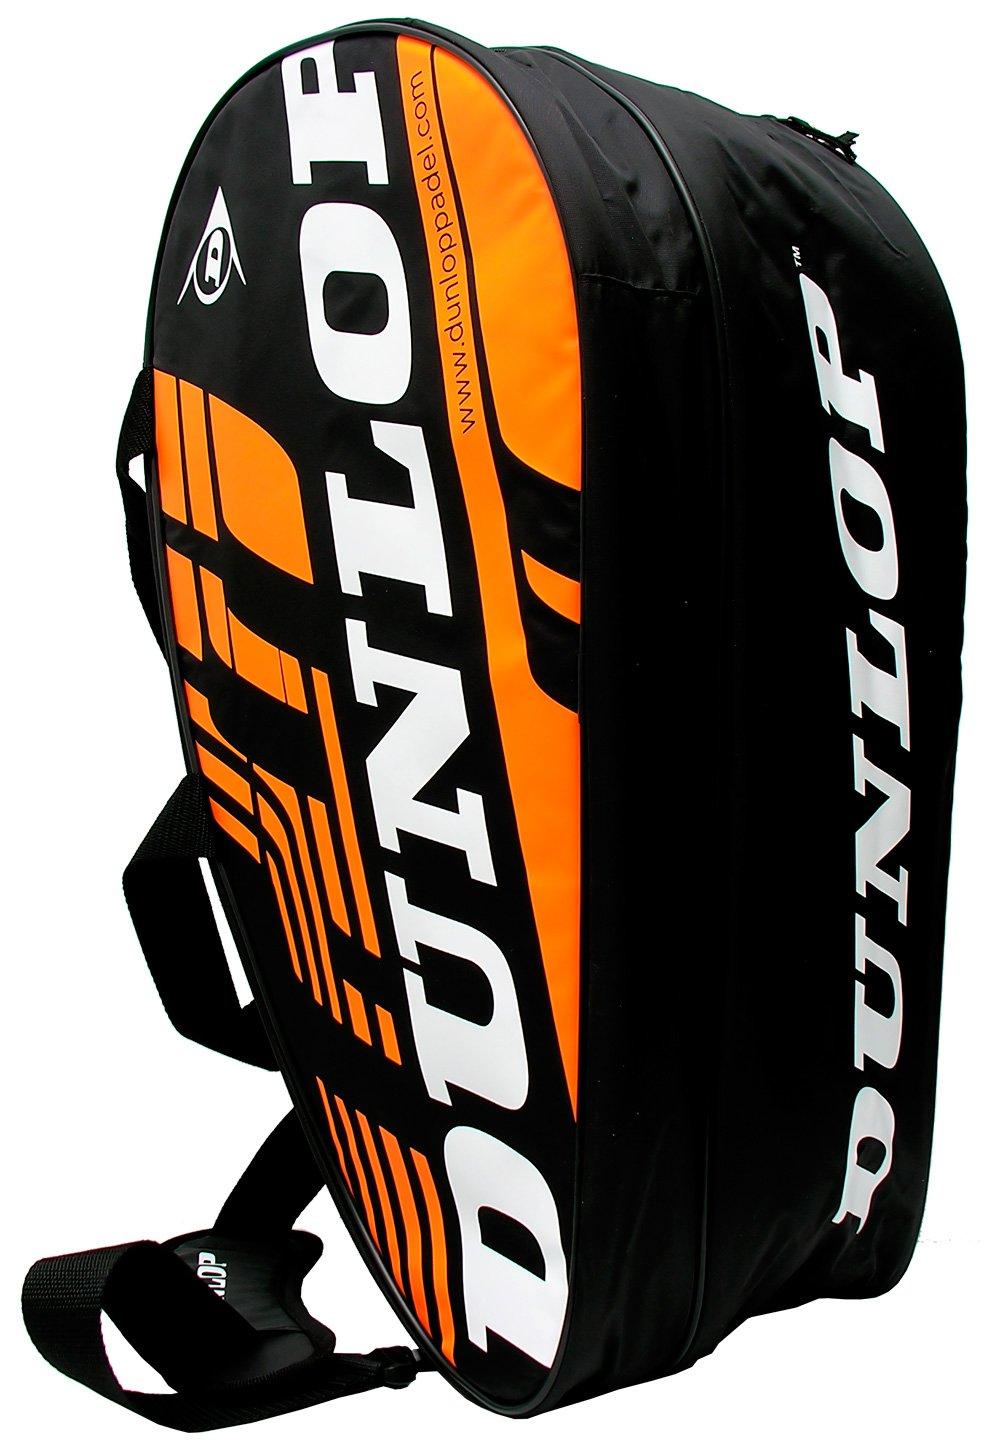 Paletero de pá del Dunlop Play Naranja 2016